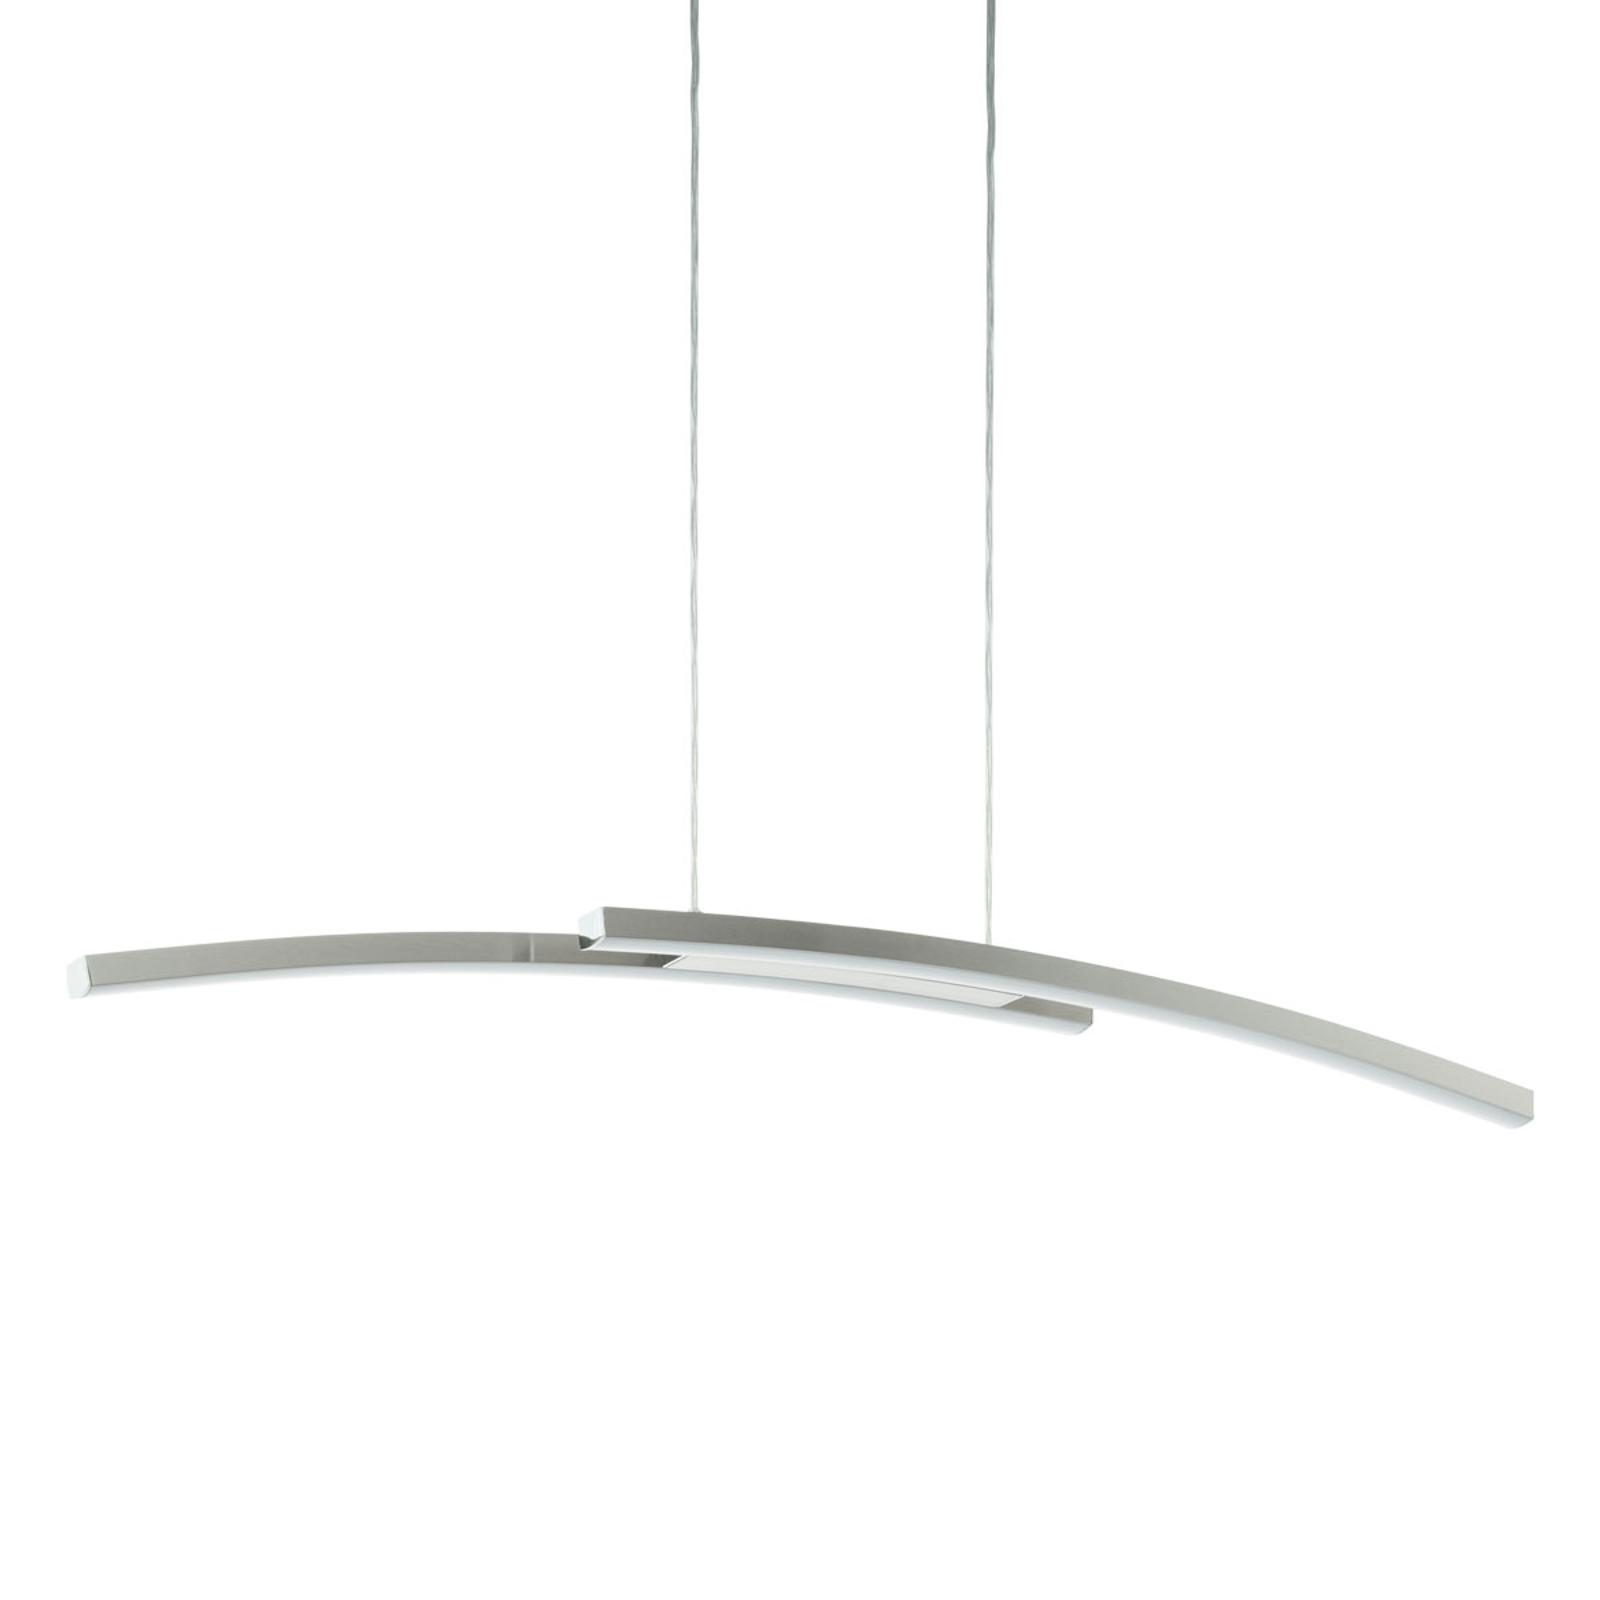 EGLO connect Fraioli-C lampa wisząca LED, wygięta